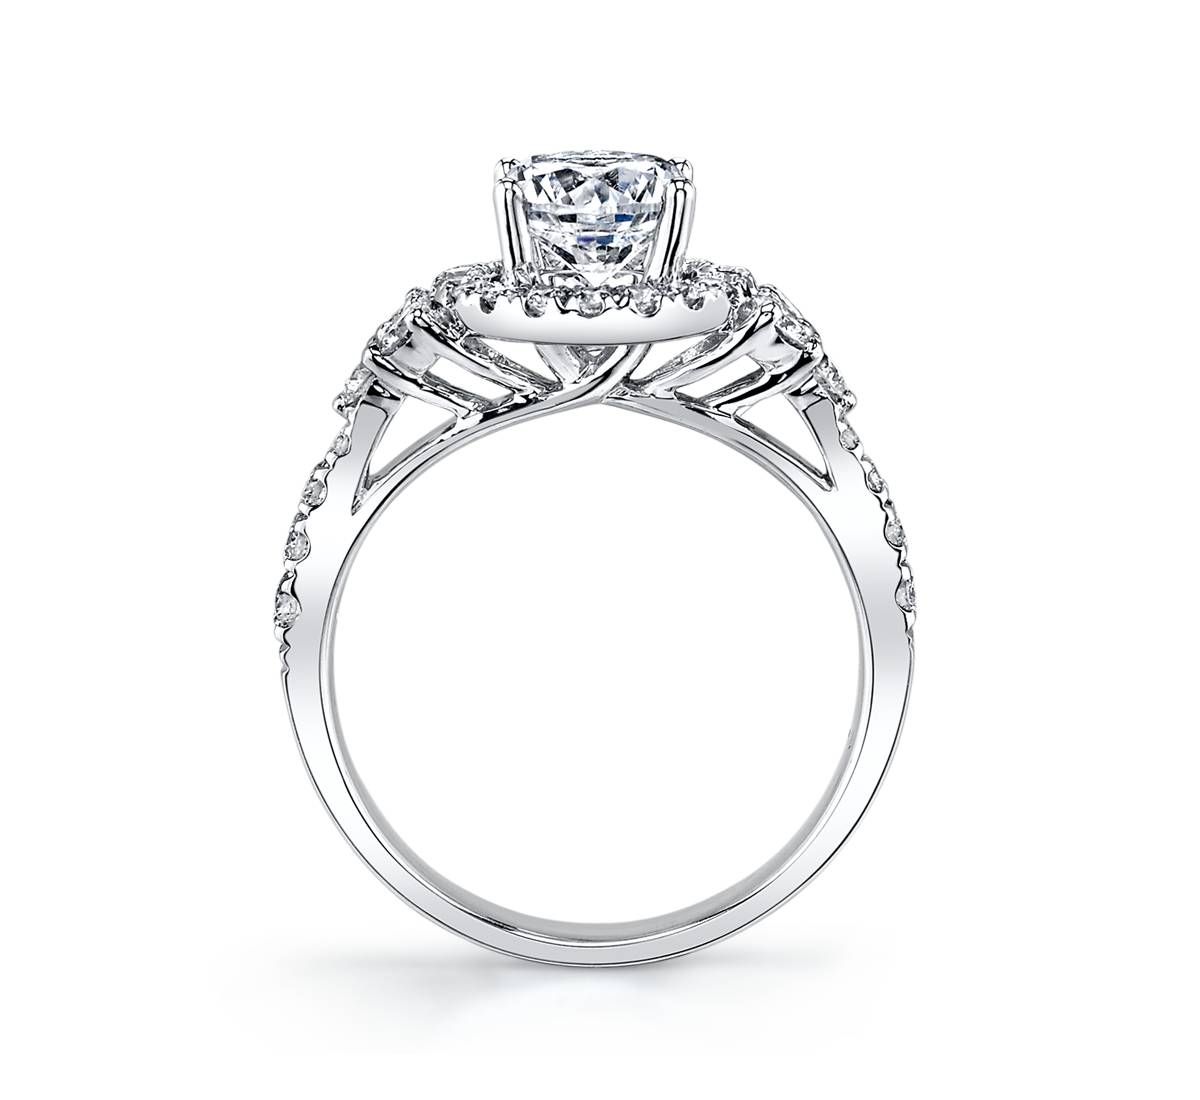 14k White Gold Halo Diamond Engagement Ring Setting 5/8 Cttw Regarding 5 Diamond Engagement Rings (View 4 of 15)